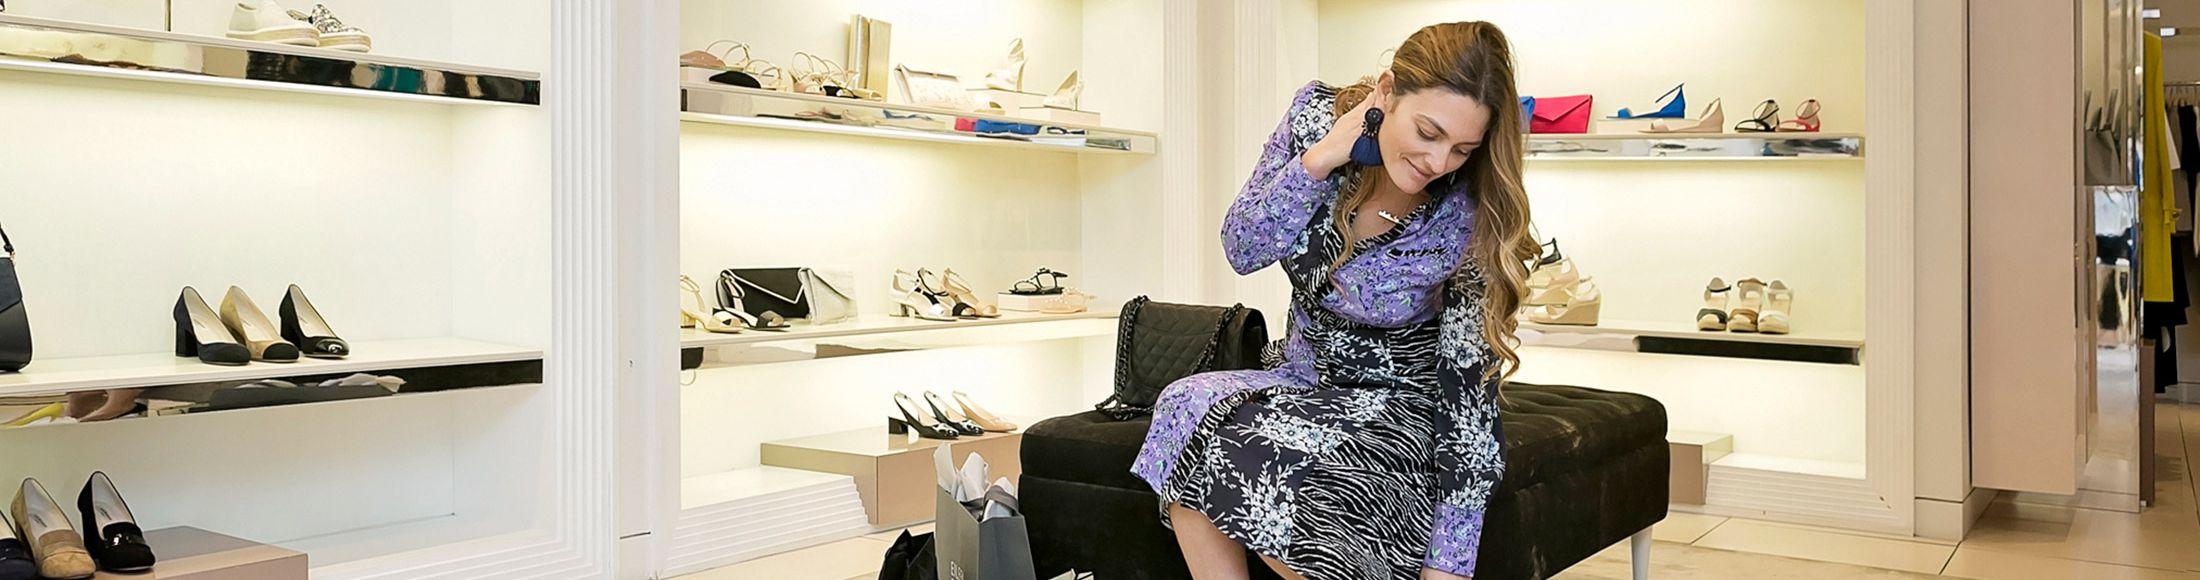 Influencer Spotlight: <br />Brianne Manz of Stroller in the City